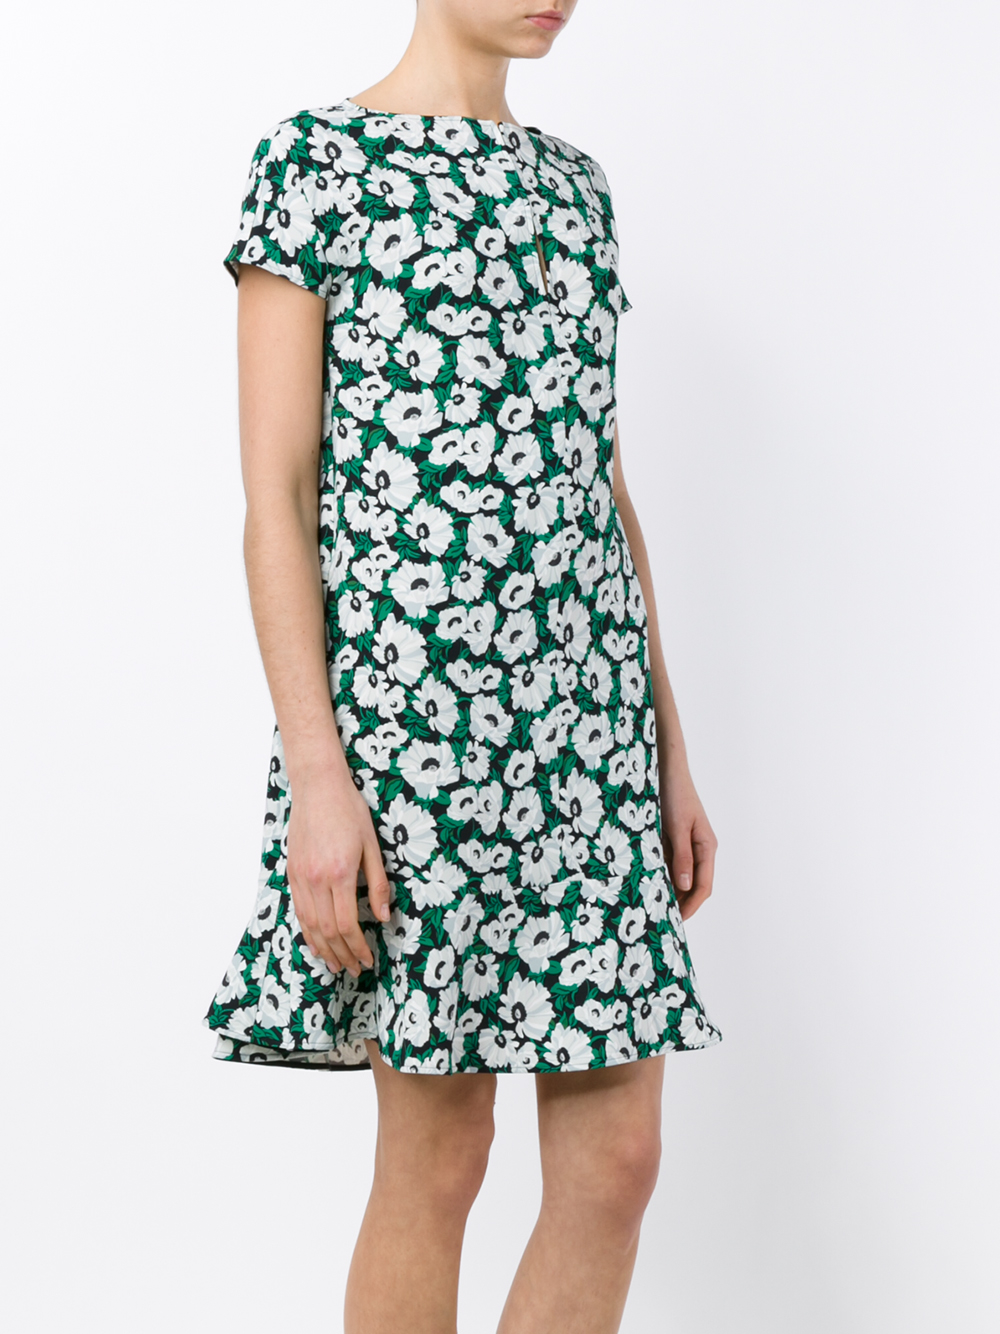 Stella McCartney Floral Print Dress Outlet Collections Factory Outlet Sale Online V9ZRGyzJj